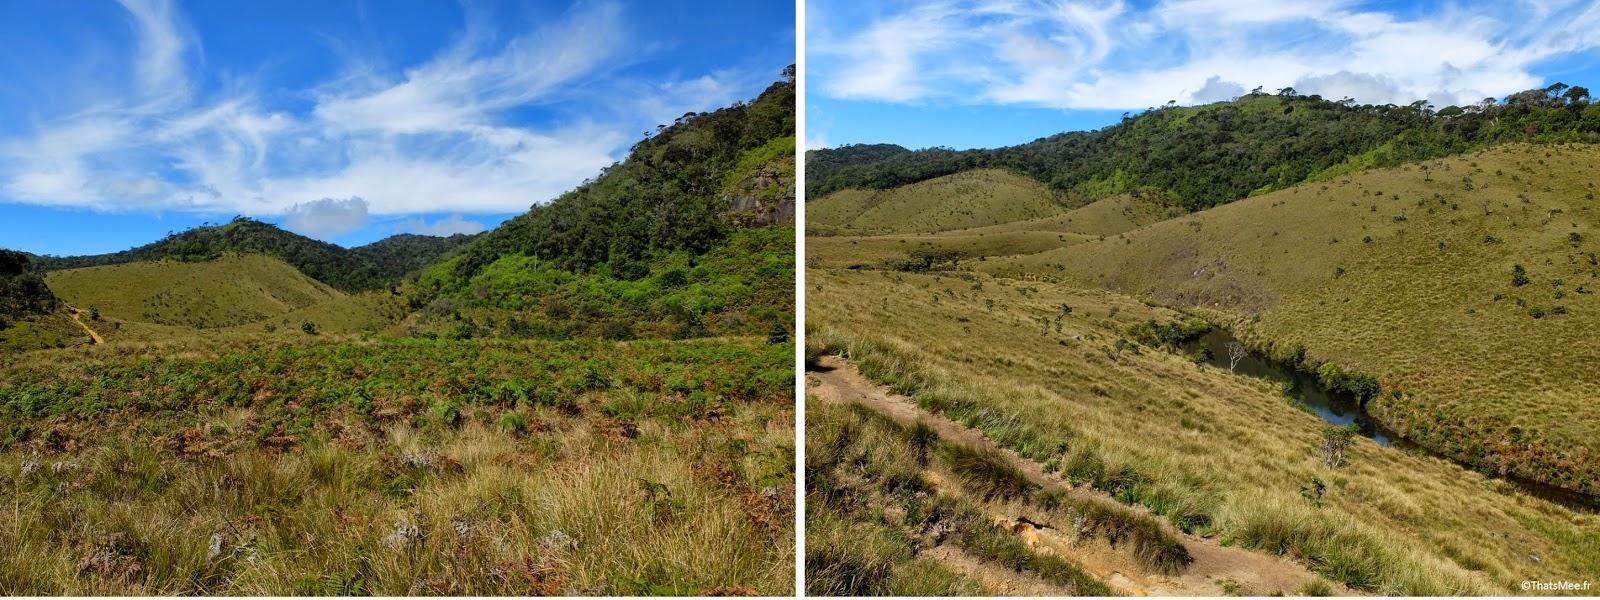 Horton Plains Sri-Lanka parc naturel 3000 hectares